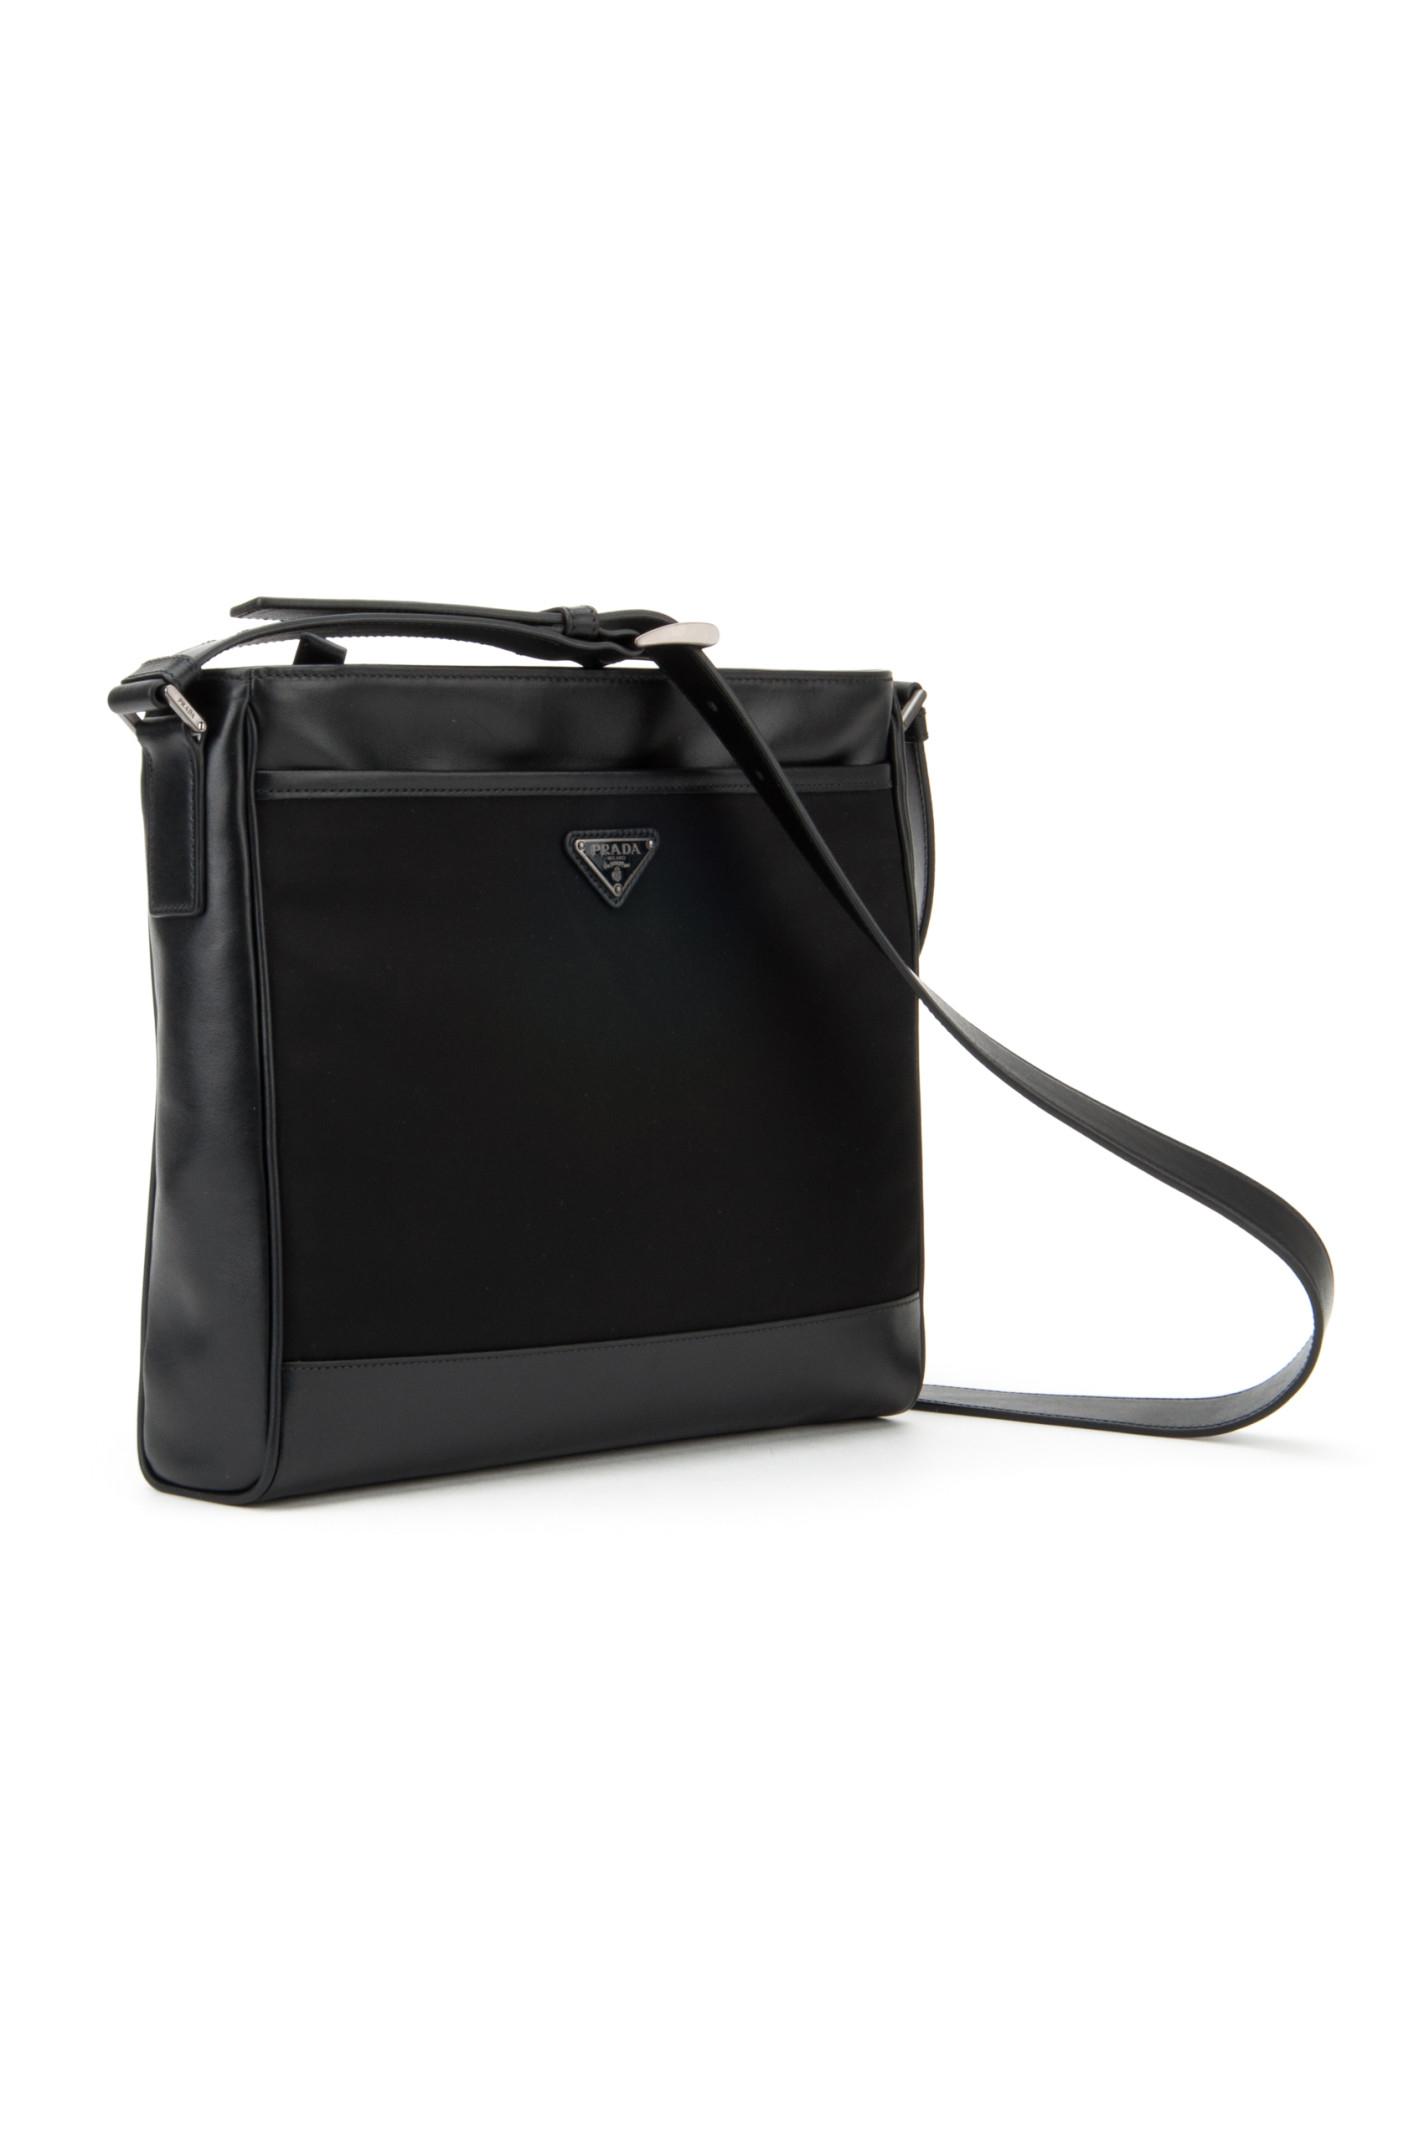 Prada Twill And Soft Calf Travel Bag in Black for Men (NERO) | Lyst